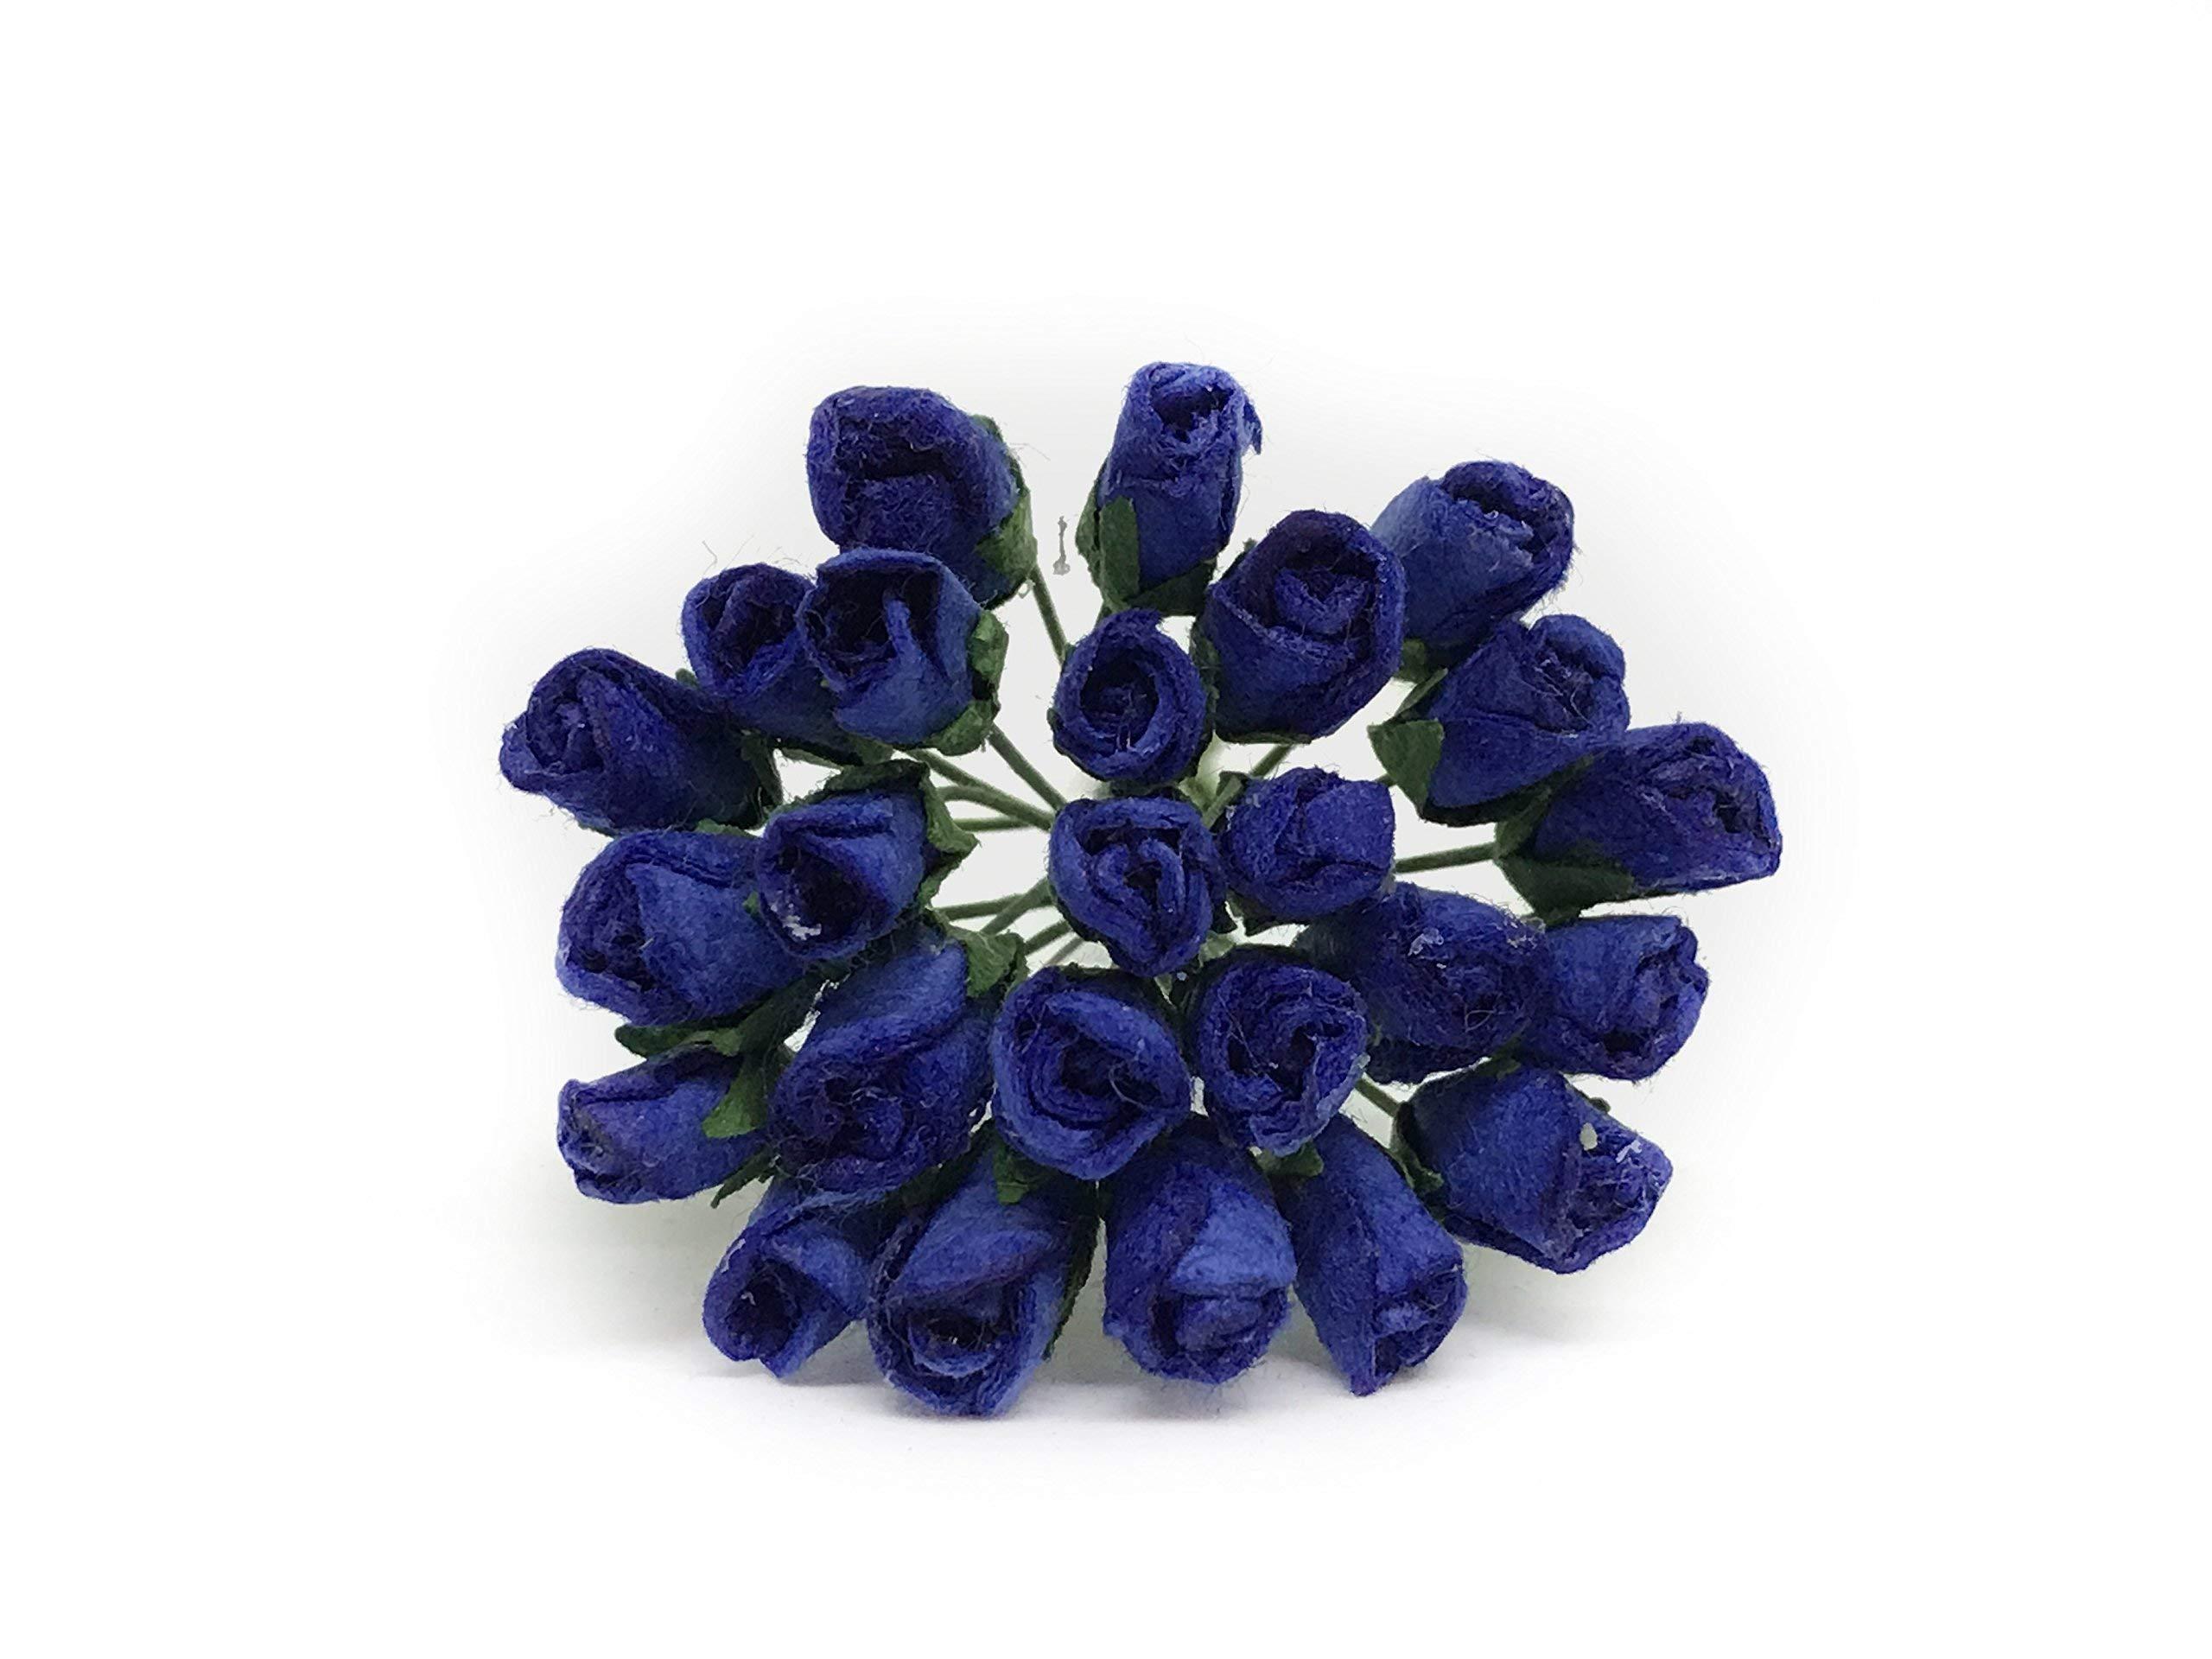 1cm-Dark-Blue-Navy-Paper-Roses-Mulberry-Paper-Flowers-Miniature-Flowers-Mulberry-Paper-Rose-Paper-Rose-Flower-Wedding-Favor-Decor-Miniature-Rose-DIY-Bouquet-Scrapbooking-Flowers-50-Pieces